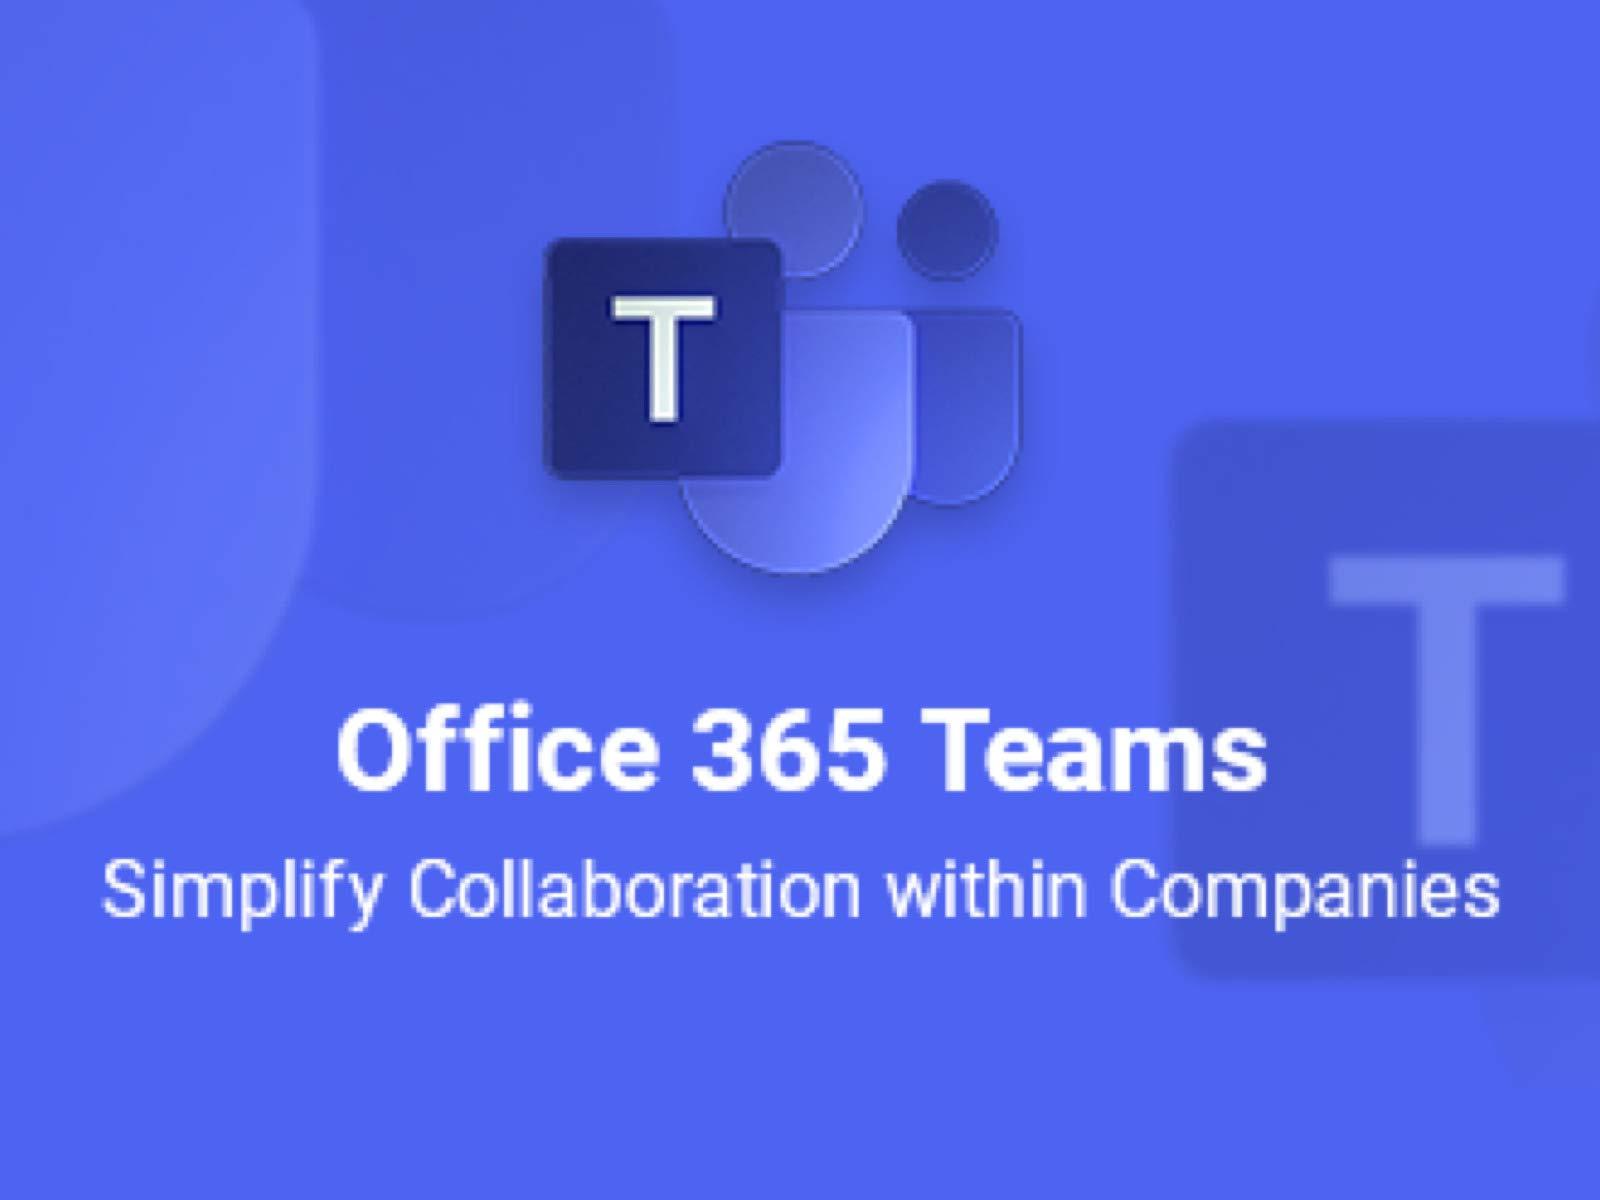 Watch Microsoft Office 365 Teams Simplify Collaboration